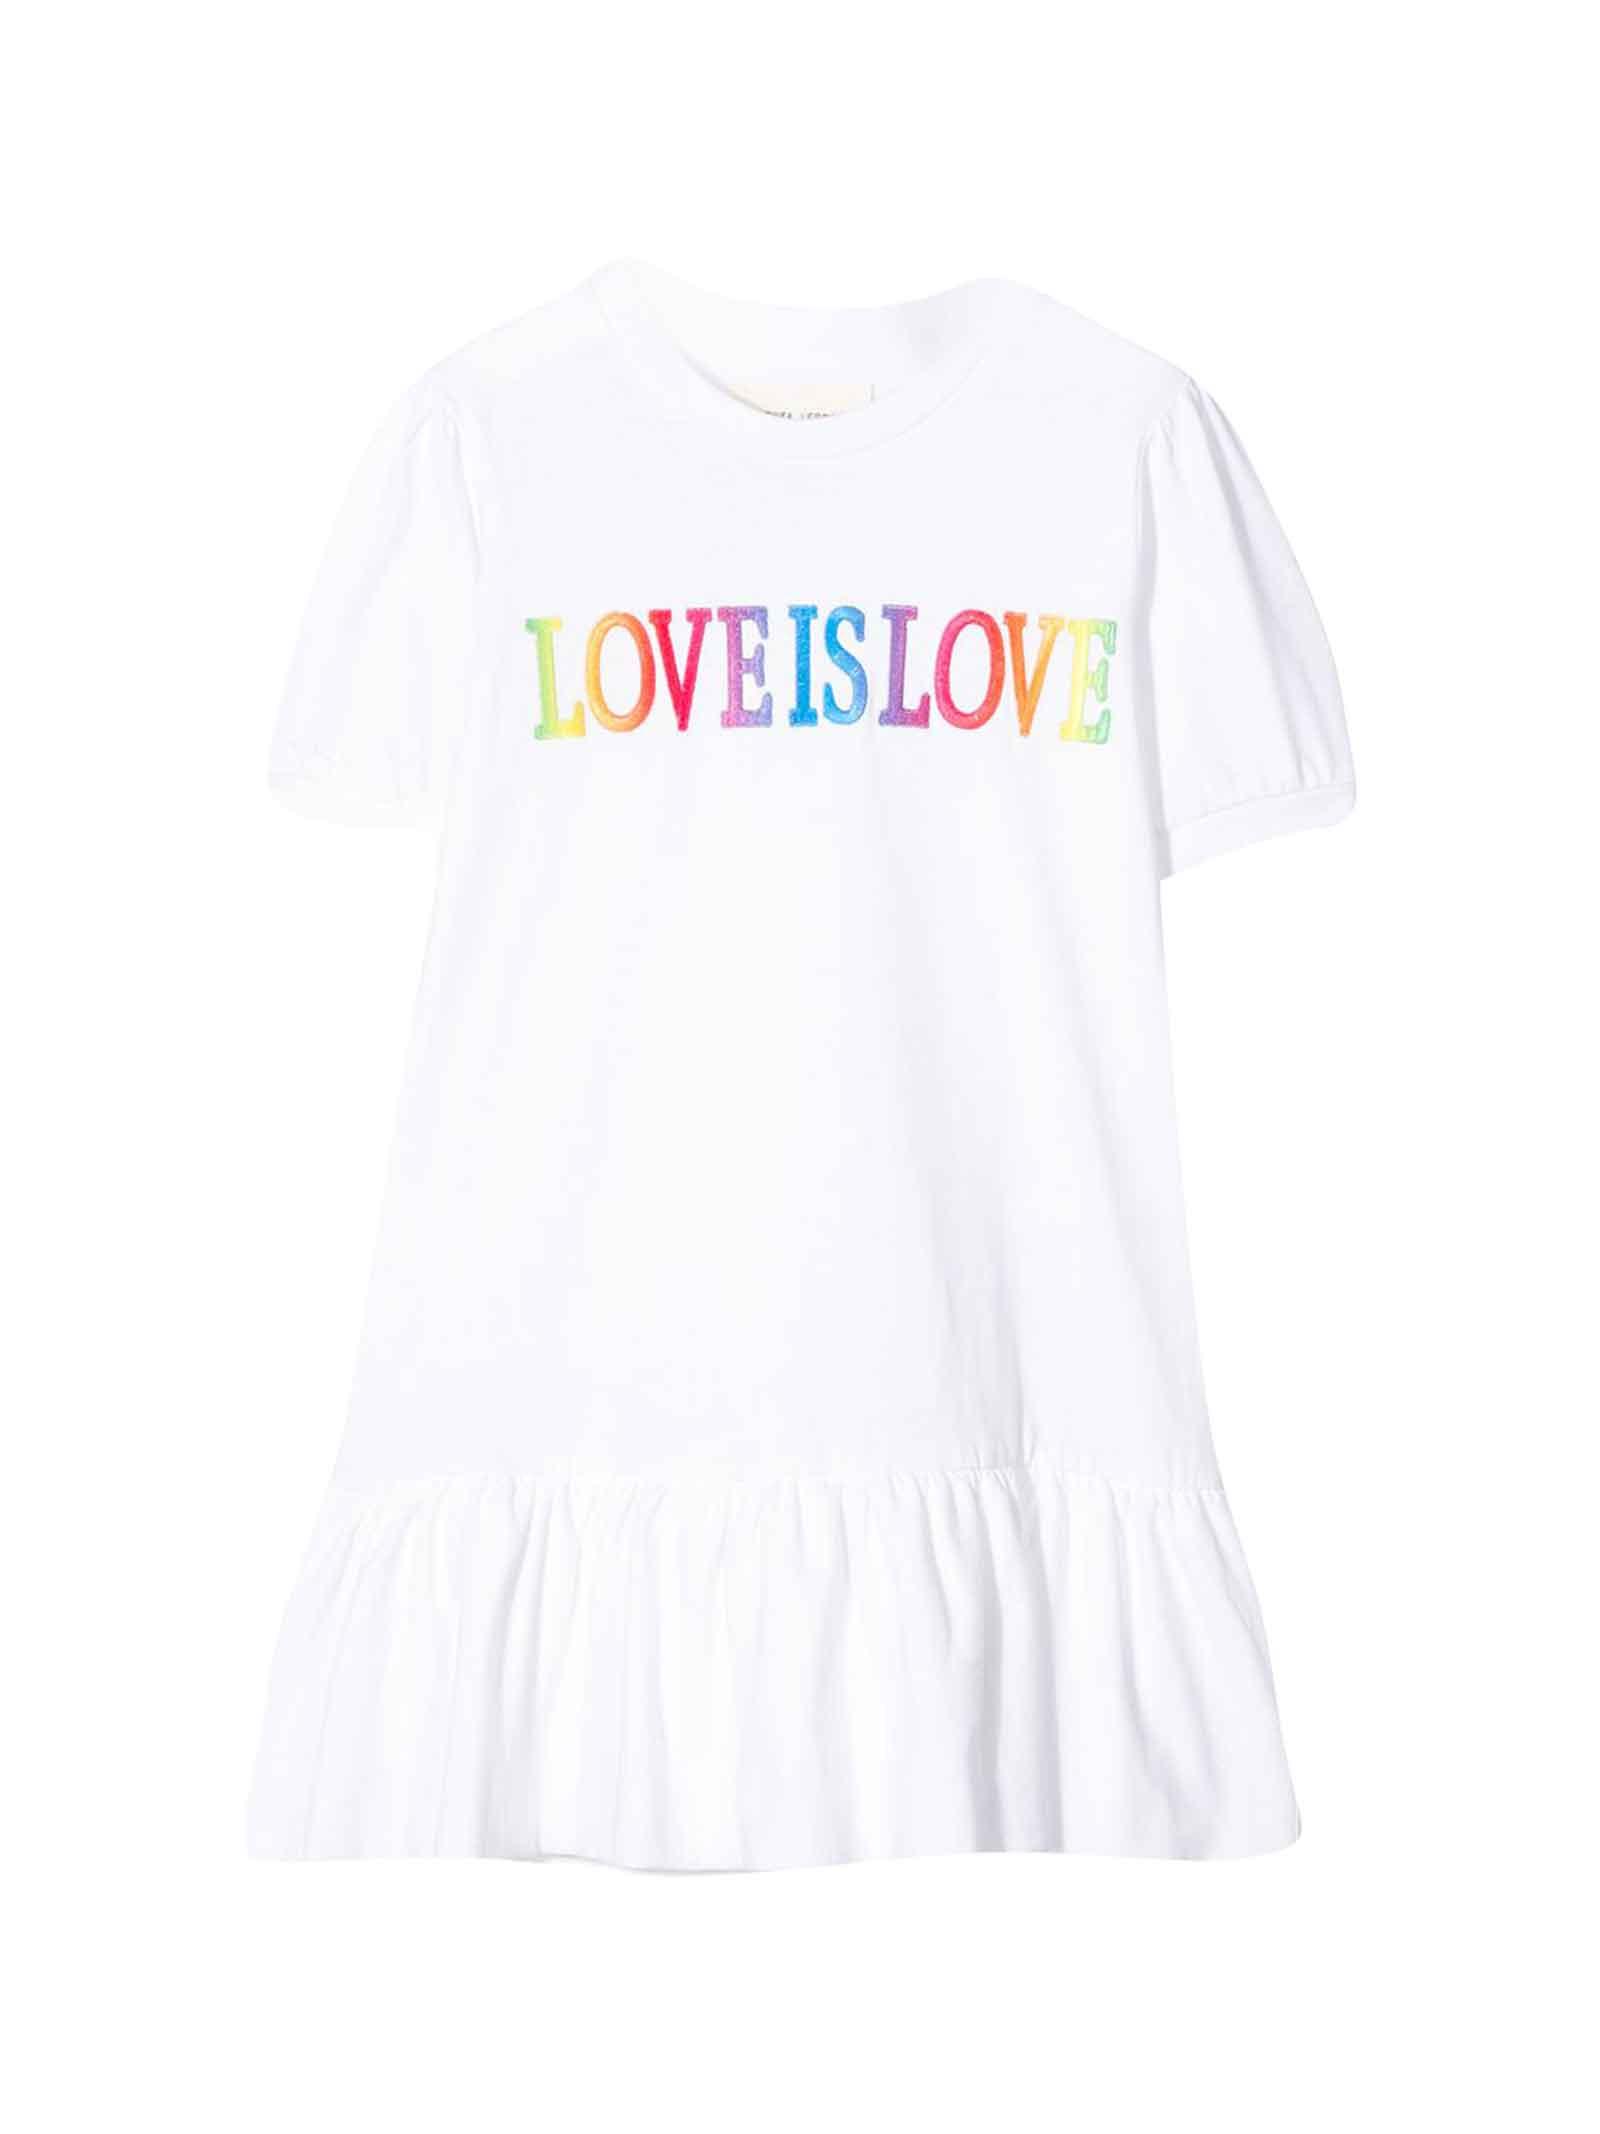 Buy Alberta Ferretti White Dress With love Is Love Embroidery online, shop Alberta Ferretti with free shipping